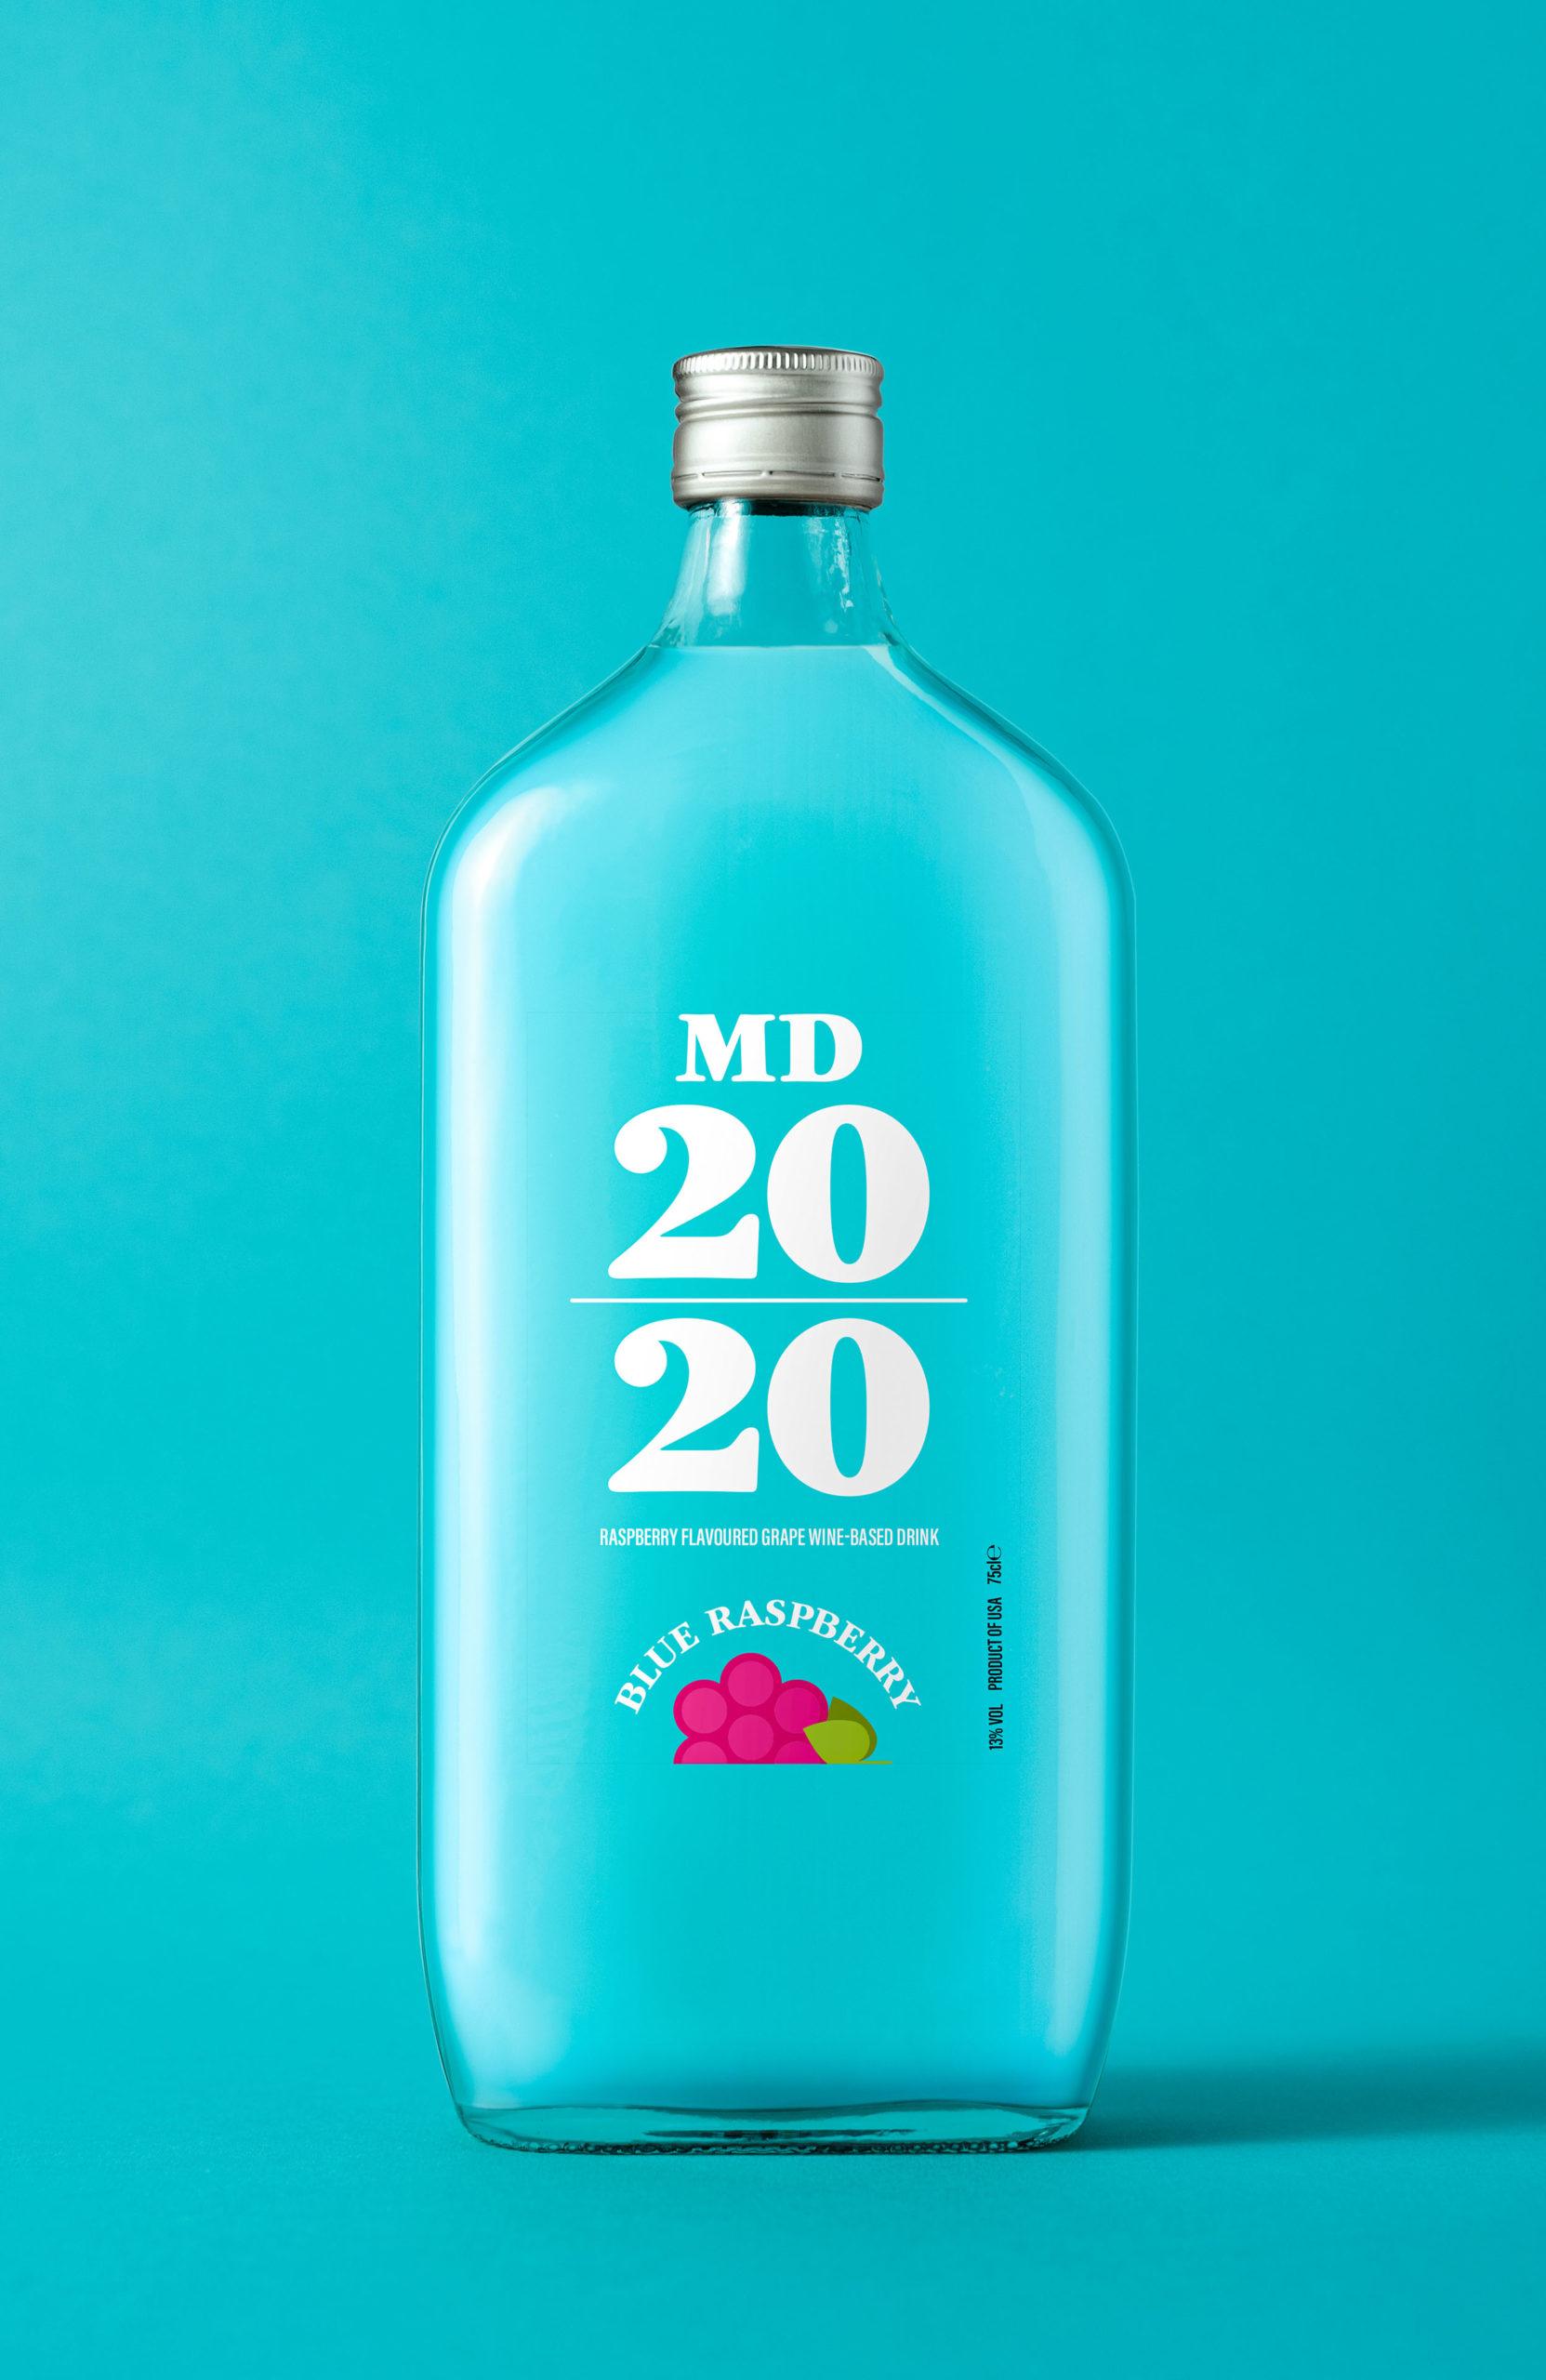 MD2020_raspberry_BG